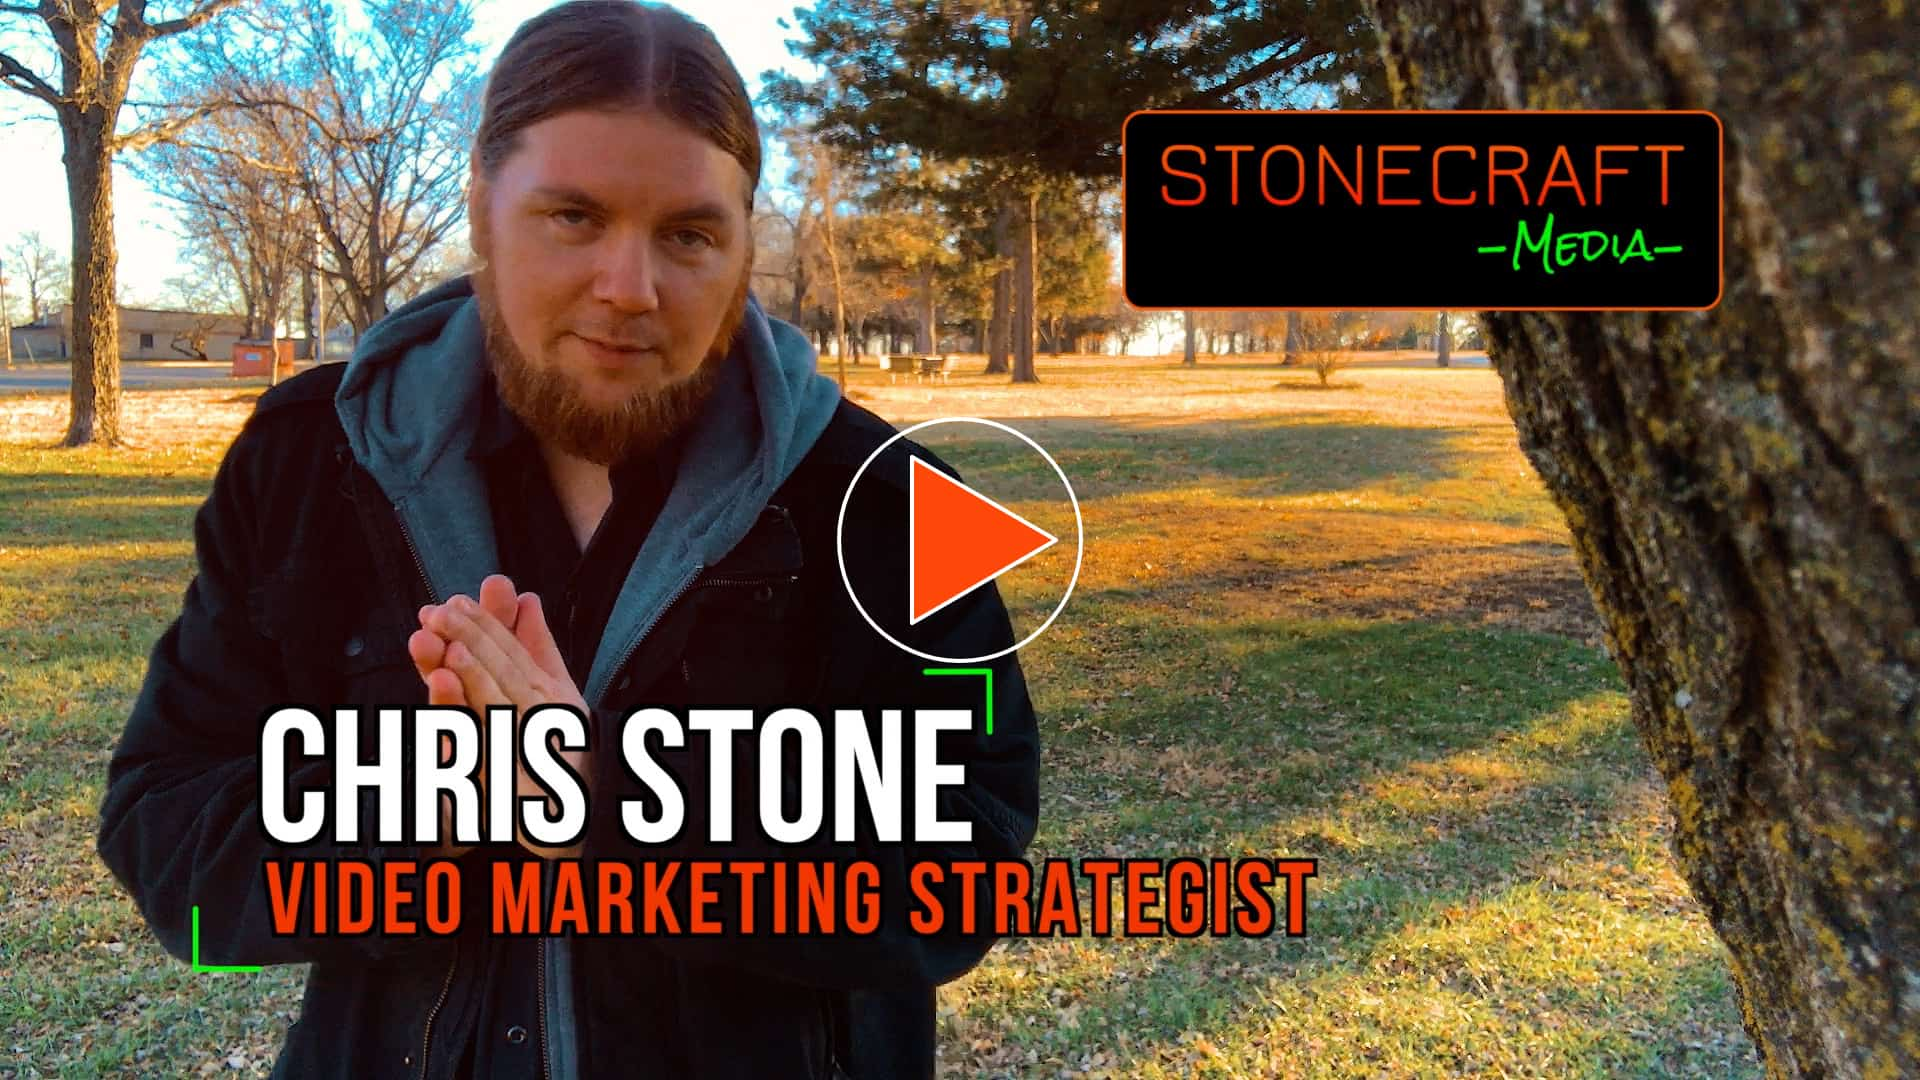 Stonecraft Media Video Business Card